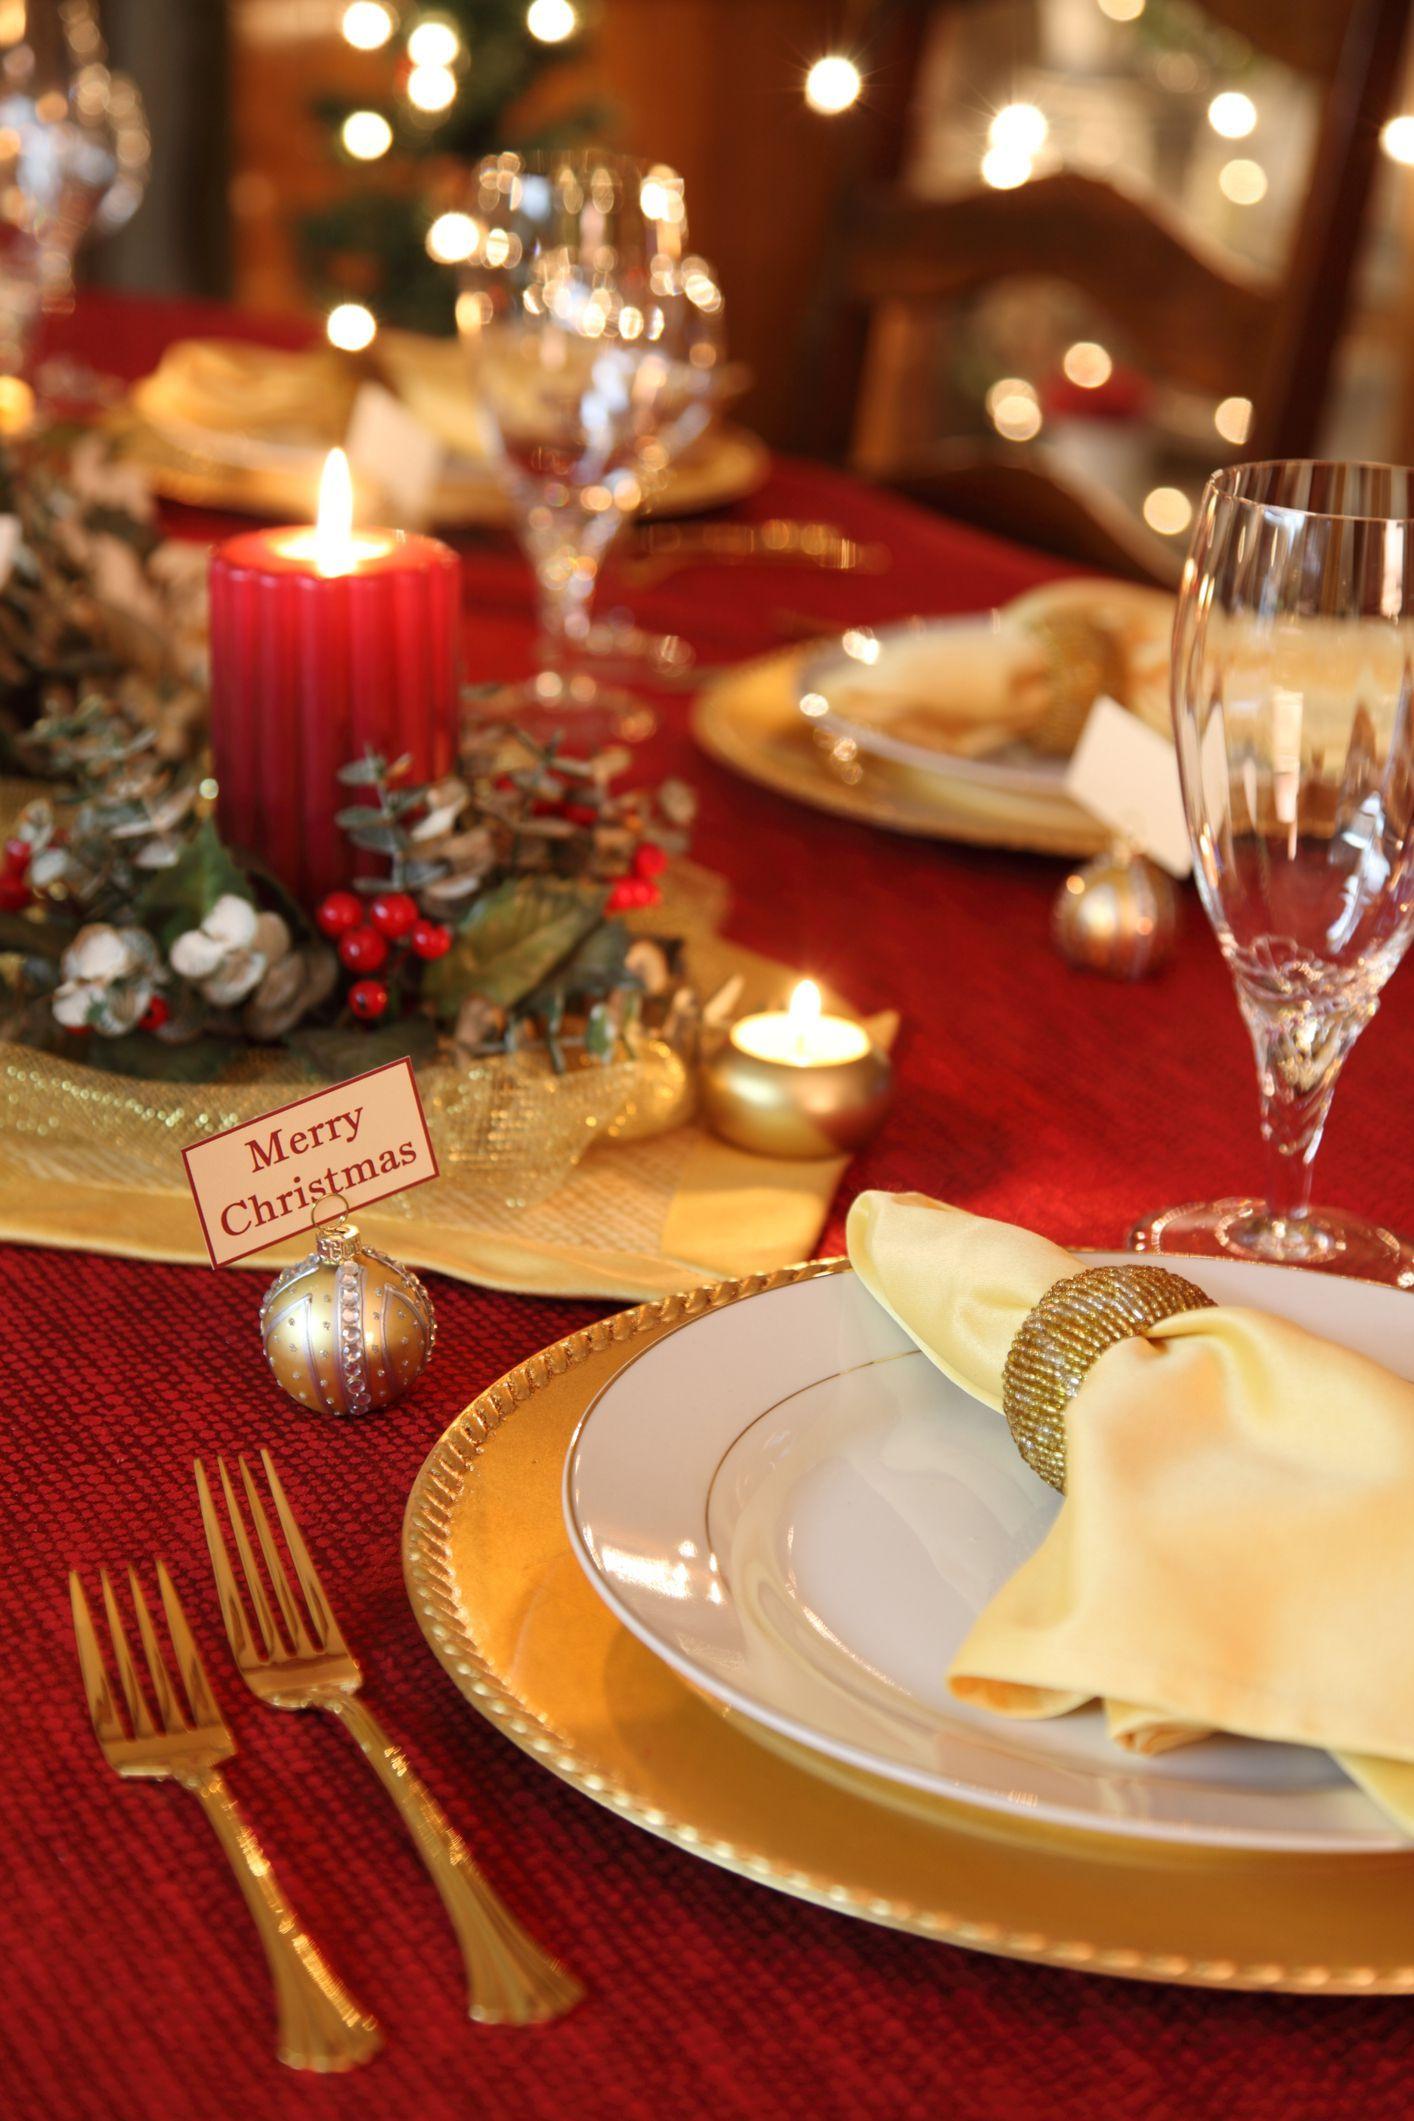 38 Elegant Christmas Table Setting Ideas Christmas Decorations Dinner Table Christmas Dinner Table Christmas Table